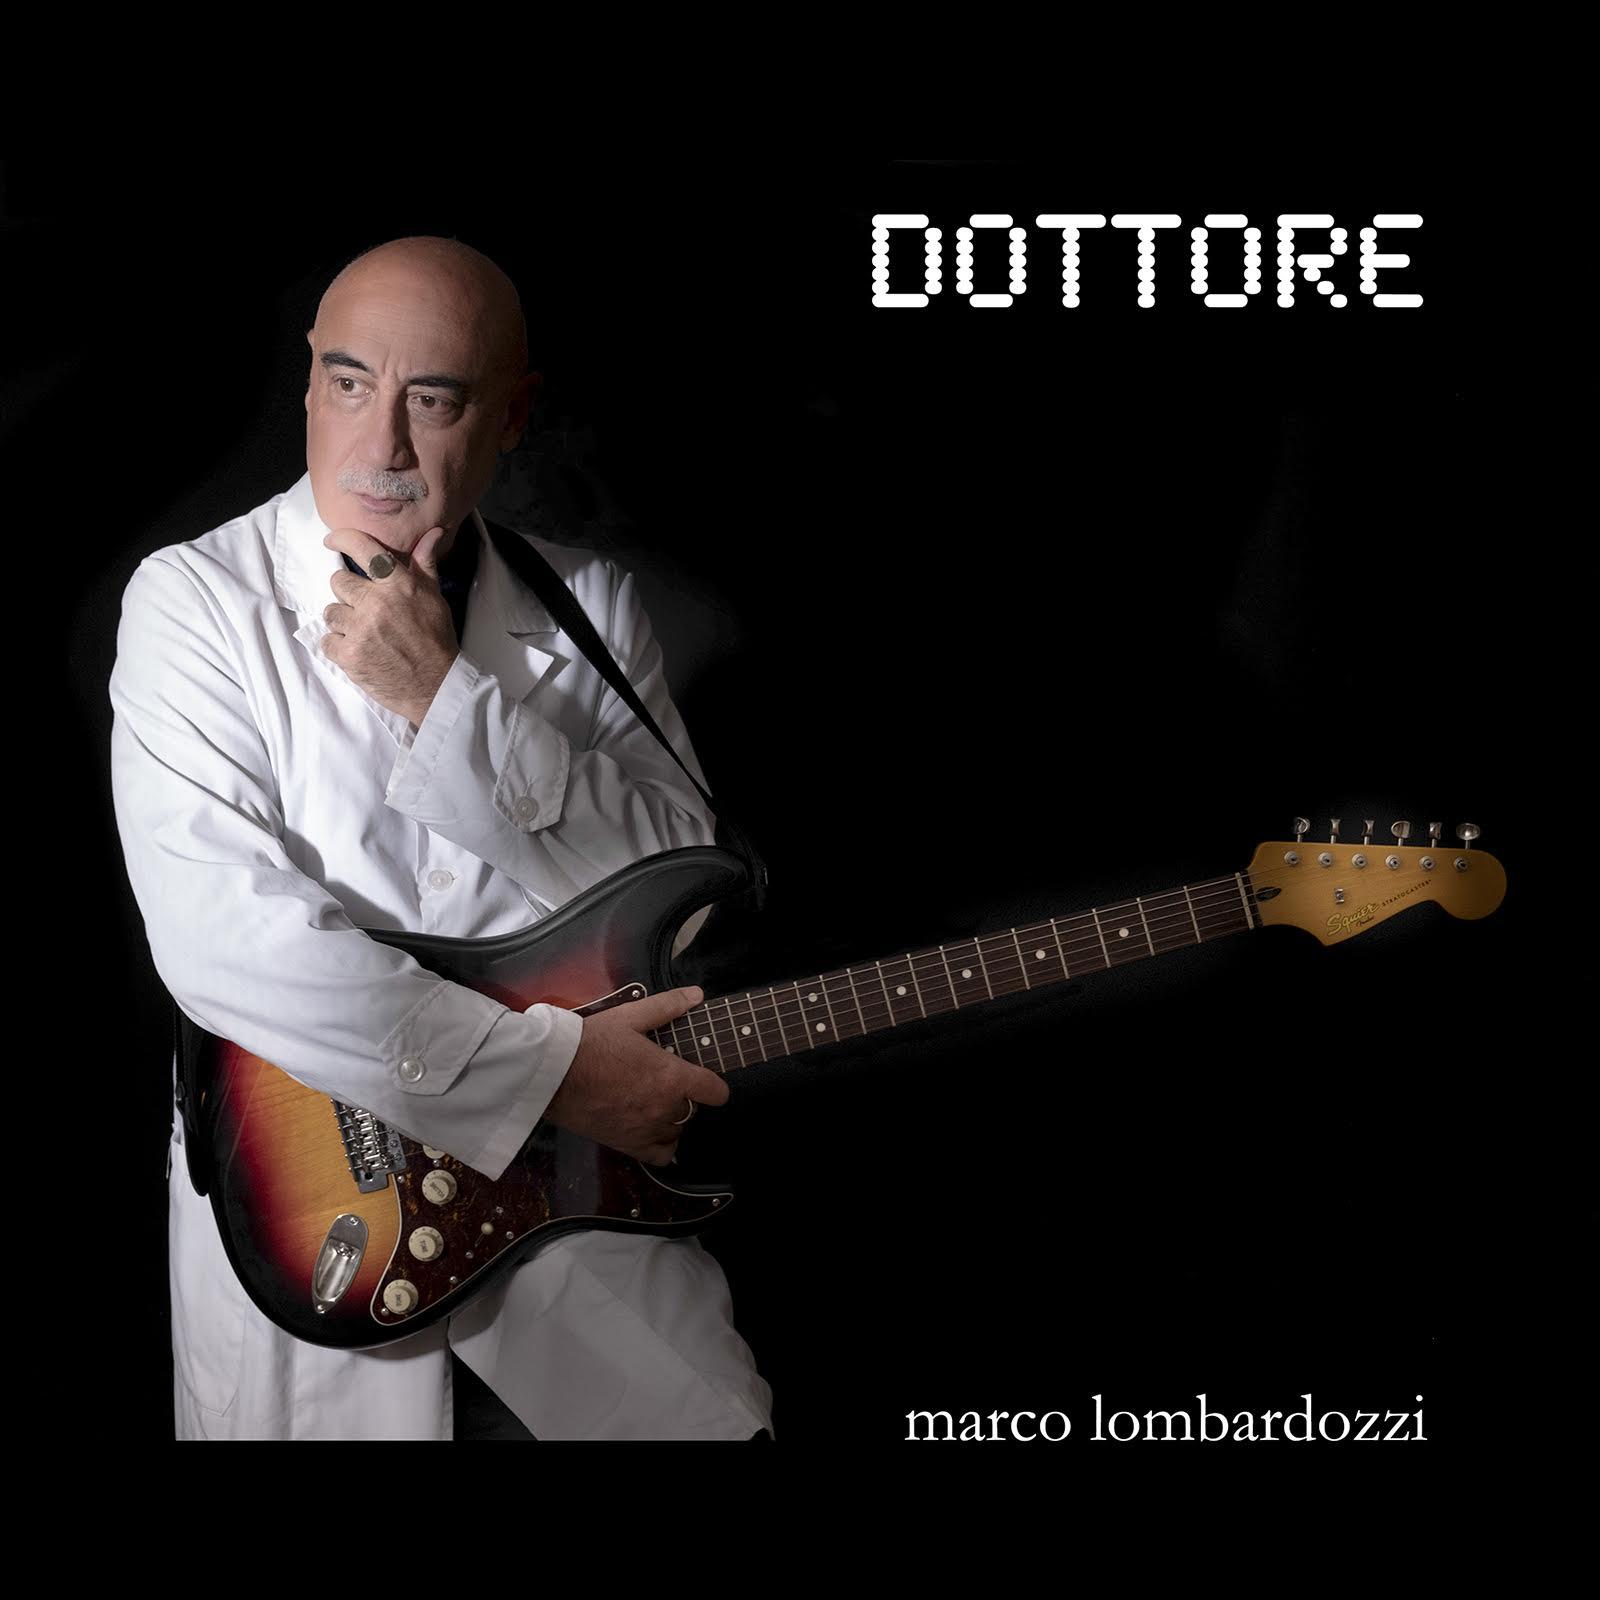 marco-lombardozzi_medico-musicista.jpg